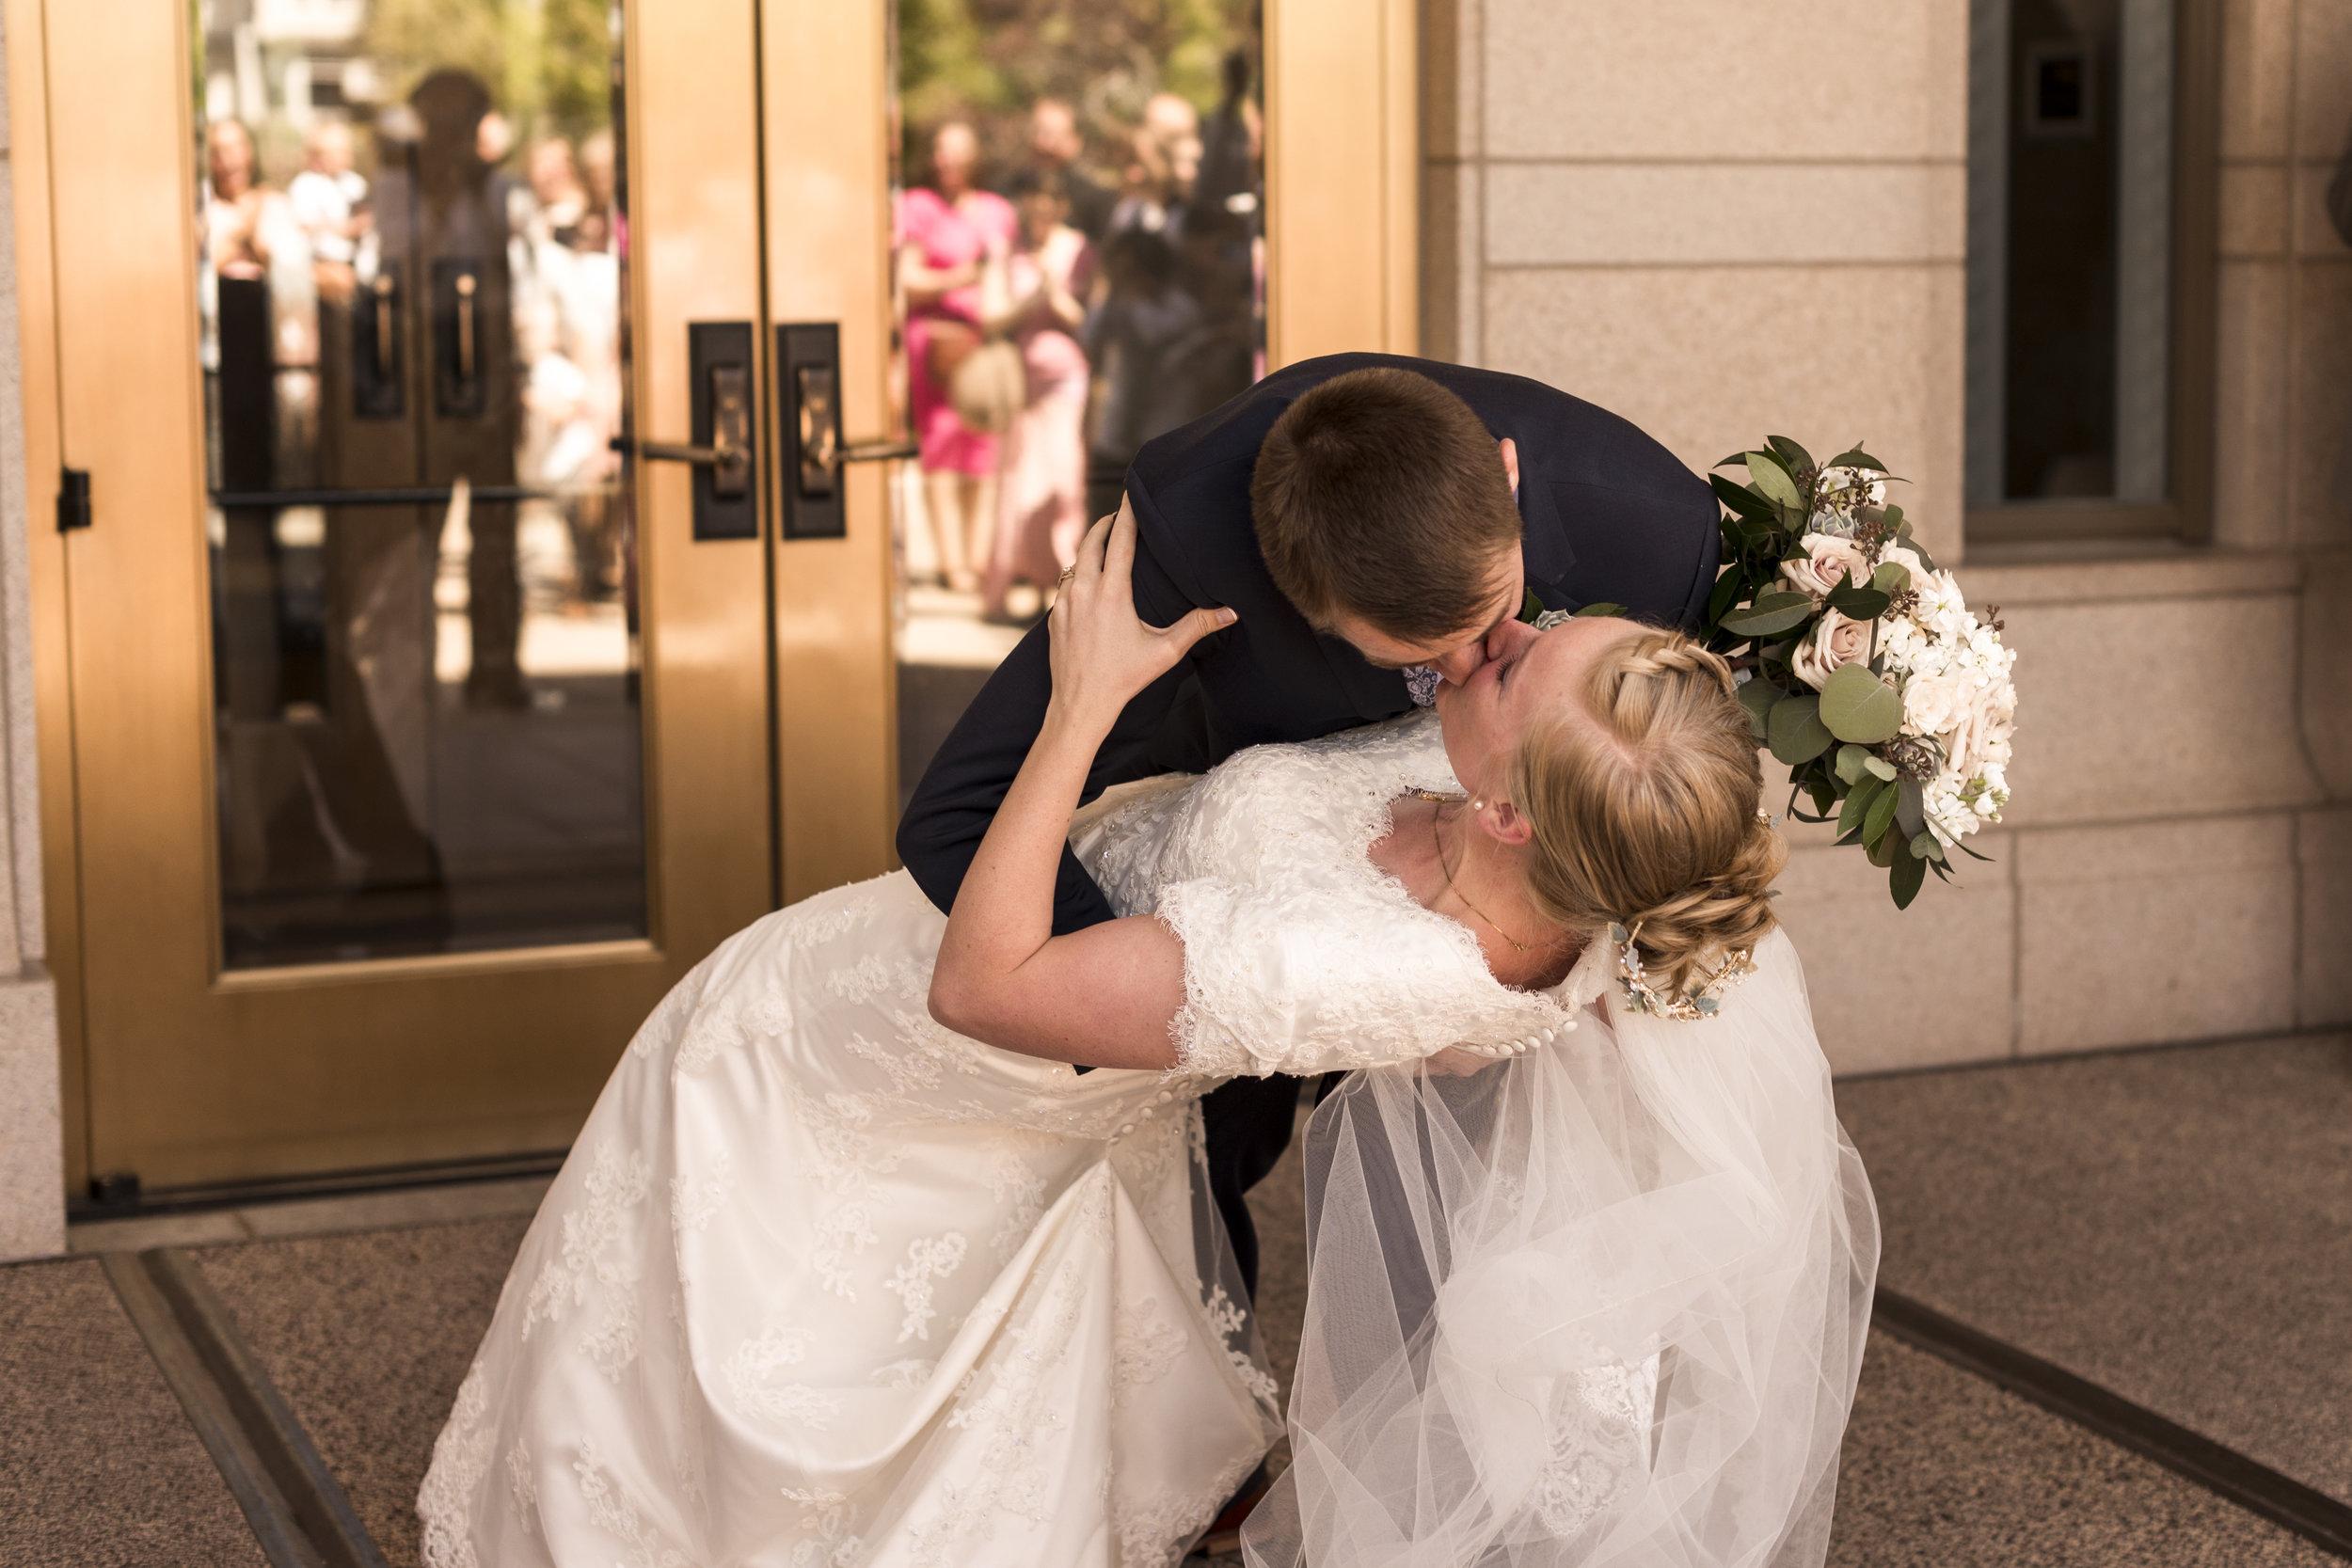 LDS Summer Wedding | South Jordan, Utah Wedding Photographer| Bri Bergman Photography 03.JPG